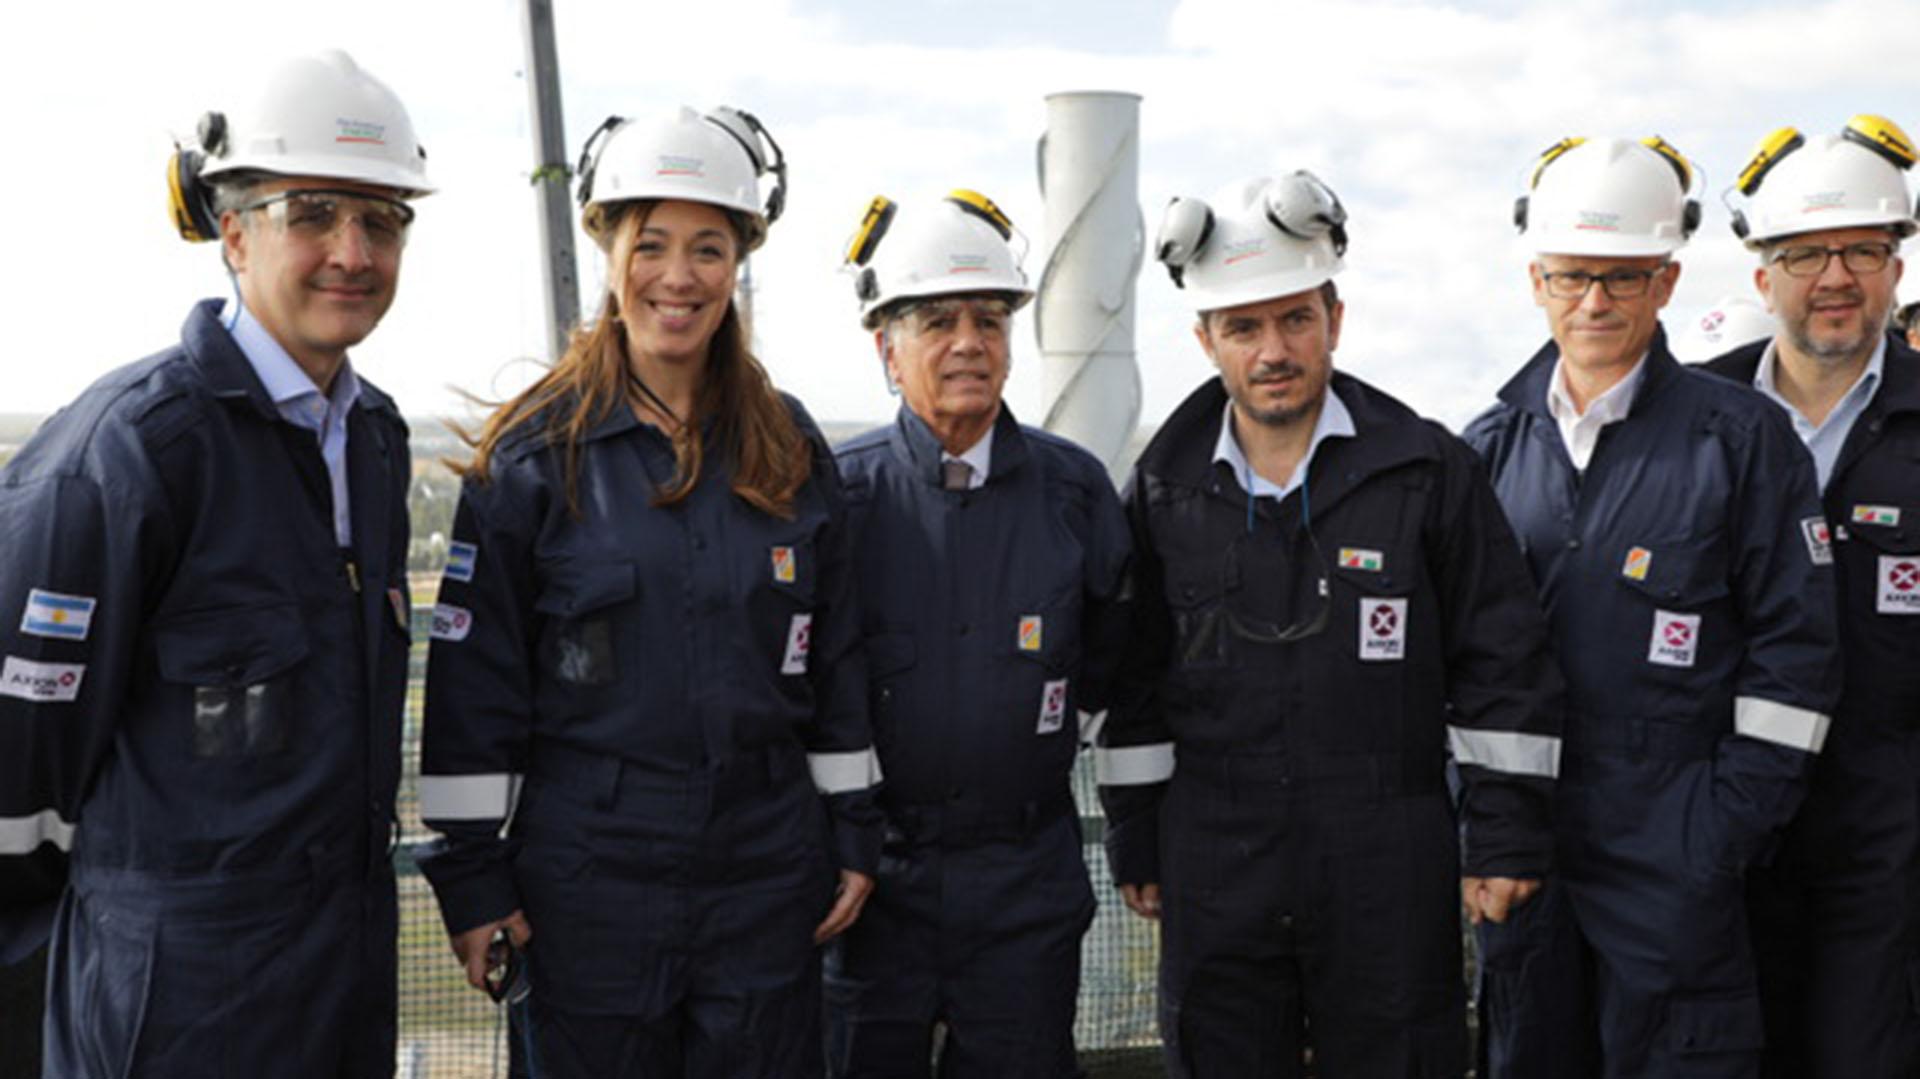 Marcos Bulgheroni, Maria Eugenia Vidal y Alejandro Bulgheroni